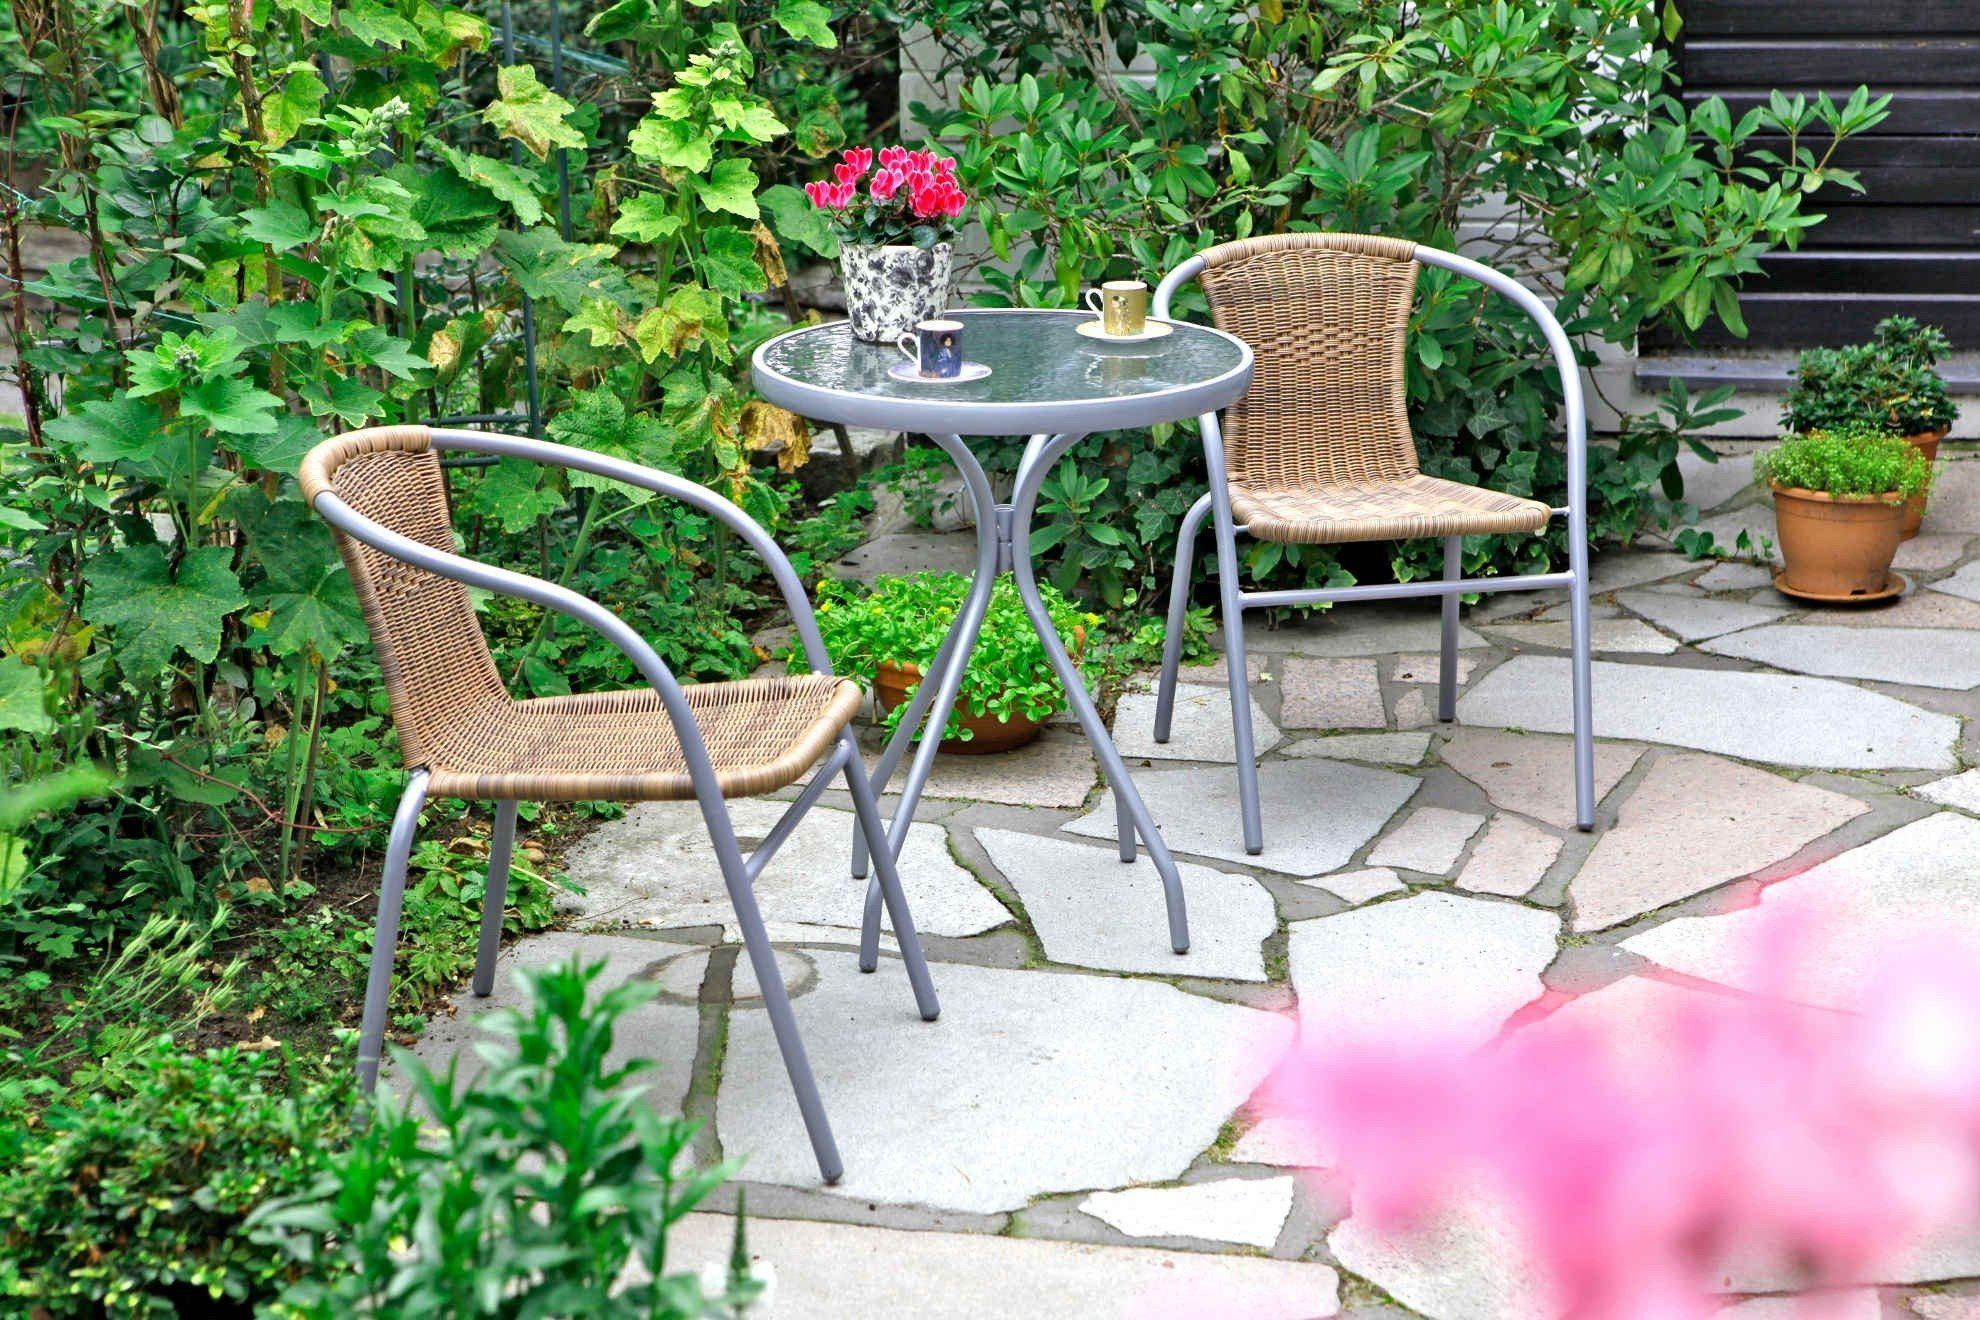 3-tgl. Gartenmöbelset »Alassio«, 2 Sessel,1 TischØ60 cm,Polyrattan